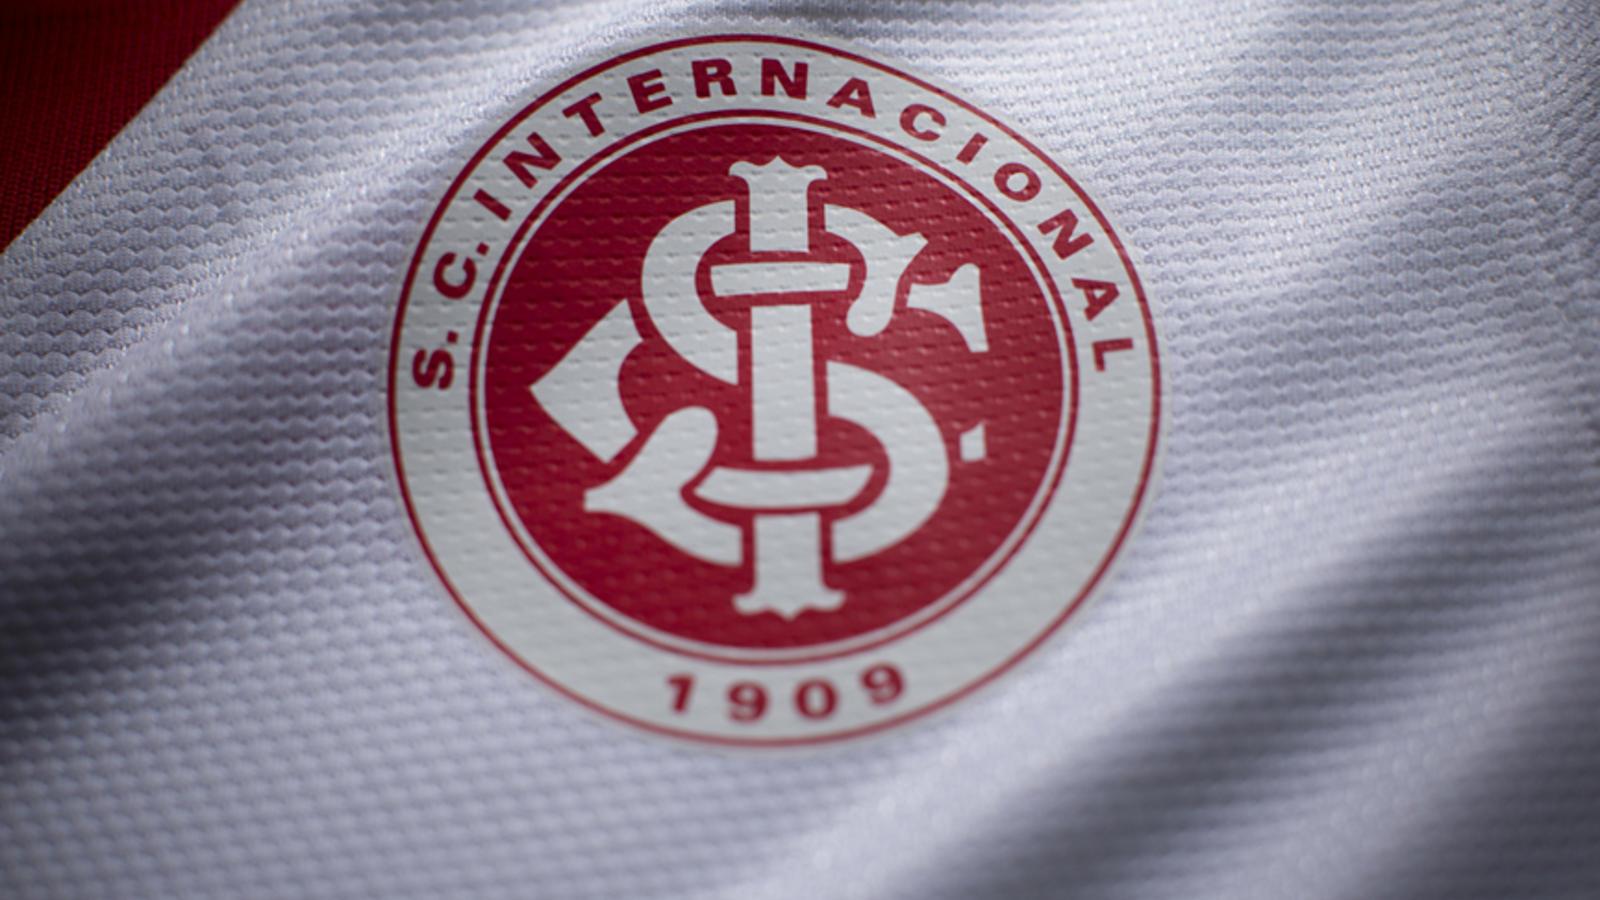 nike_futebol_internacional_away_distintivo